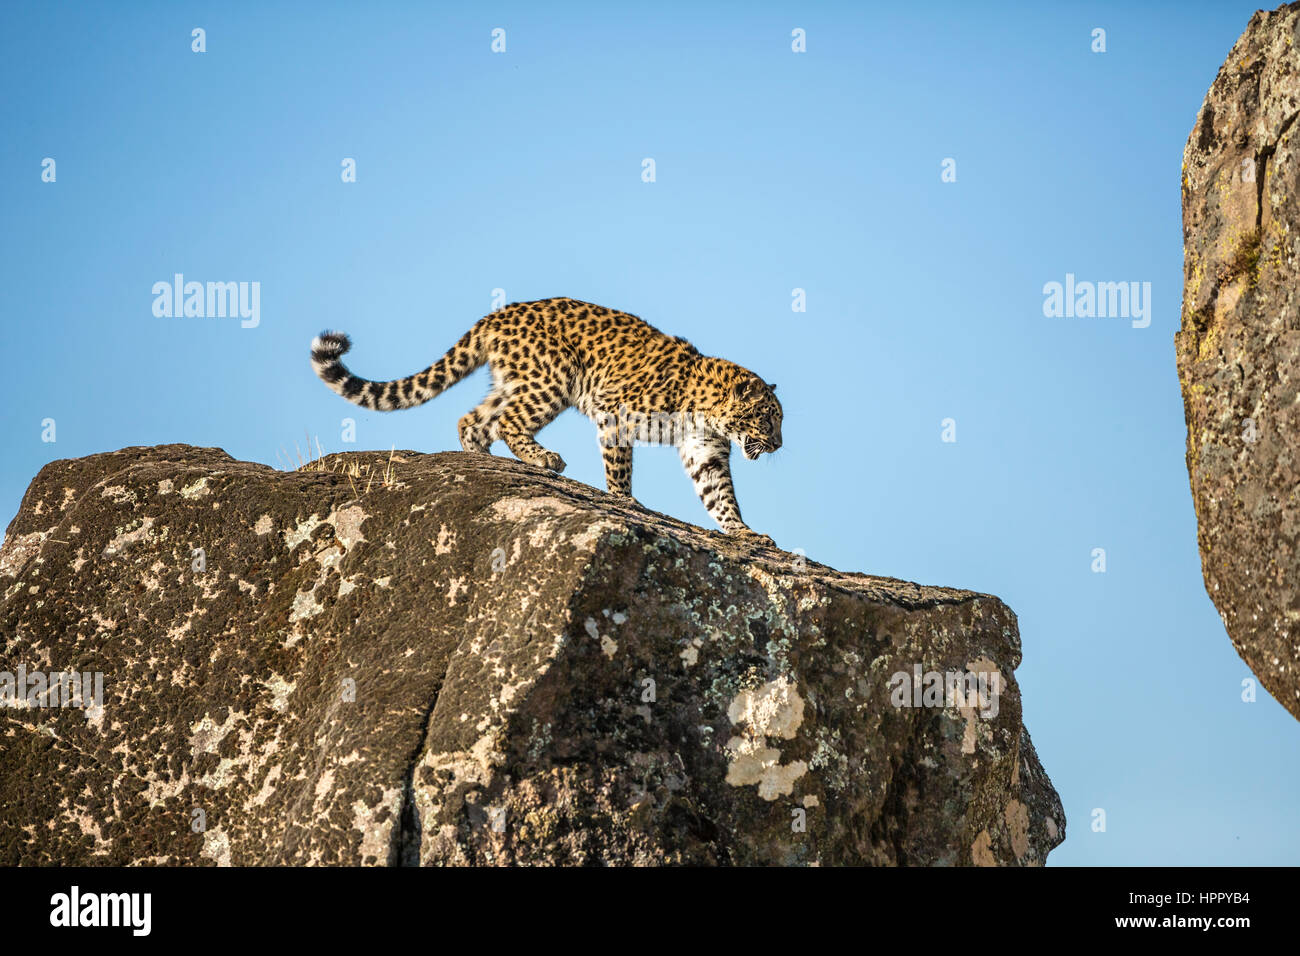 amur leopard on pile of rocks - Stock Image